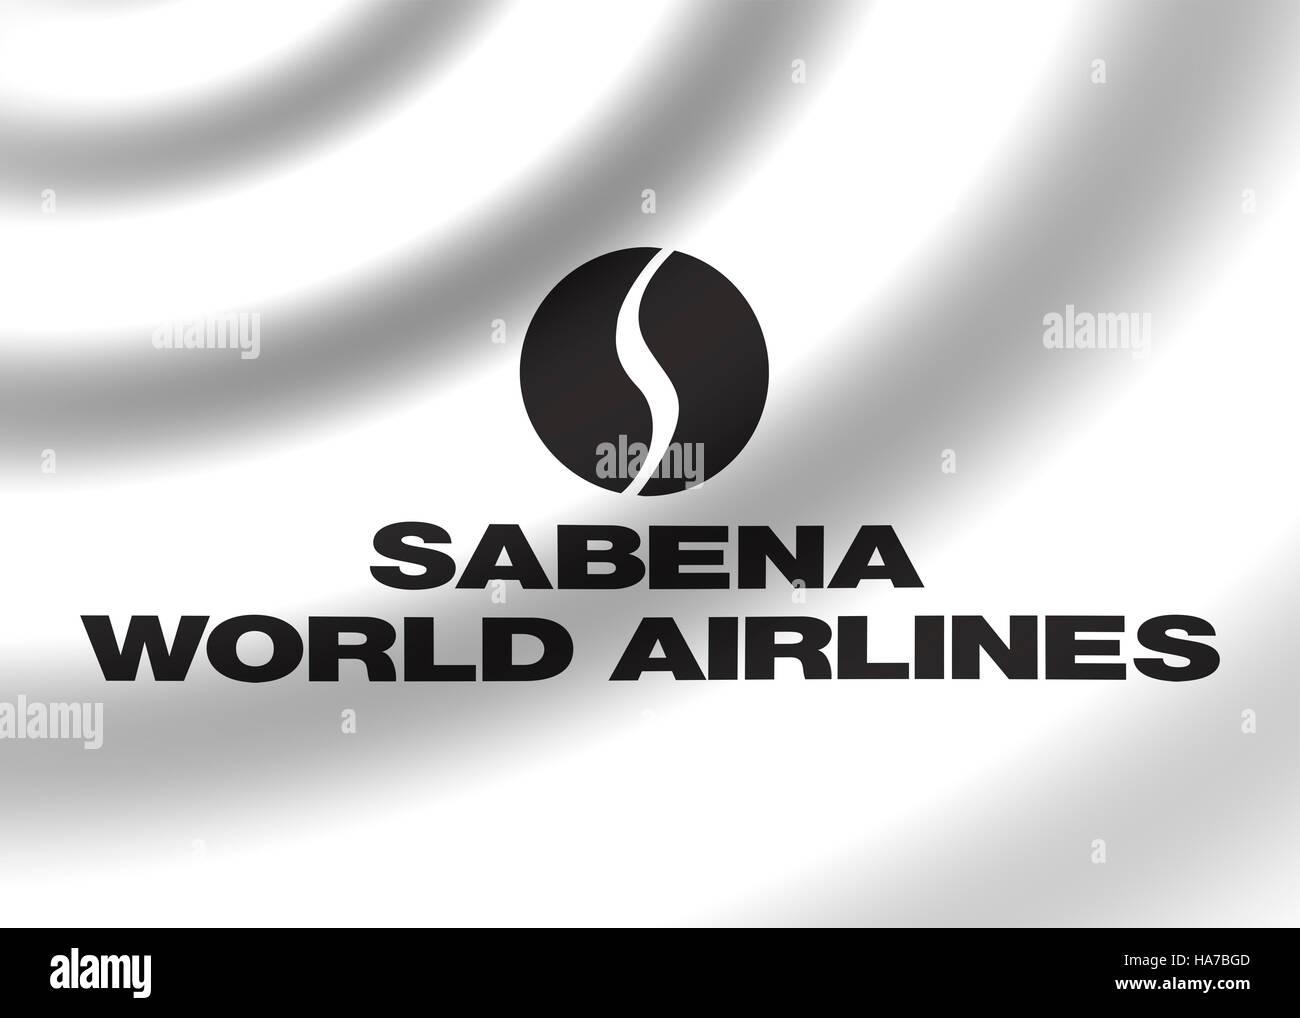 Sabena World Airlines logo Stock Photo